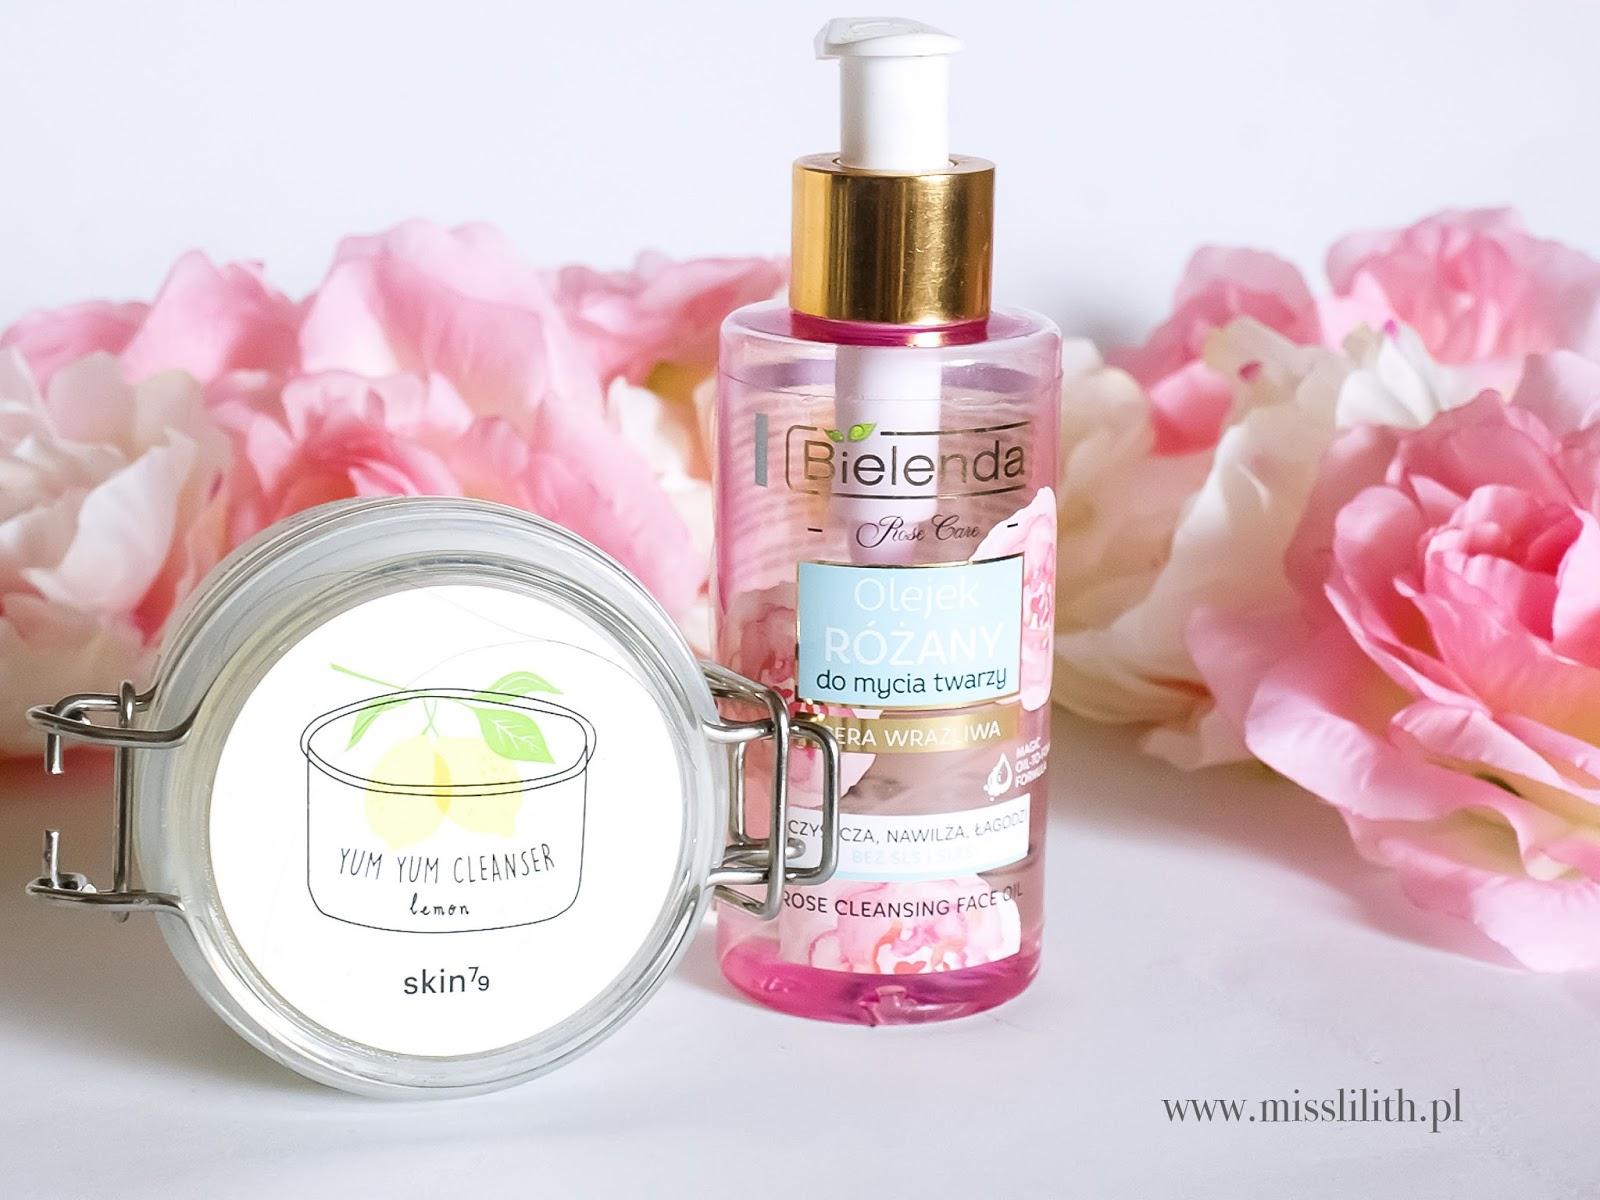 Olejek różany do mycia twarzy Bielenda. Yum Yum Clenser Lemon Skin79